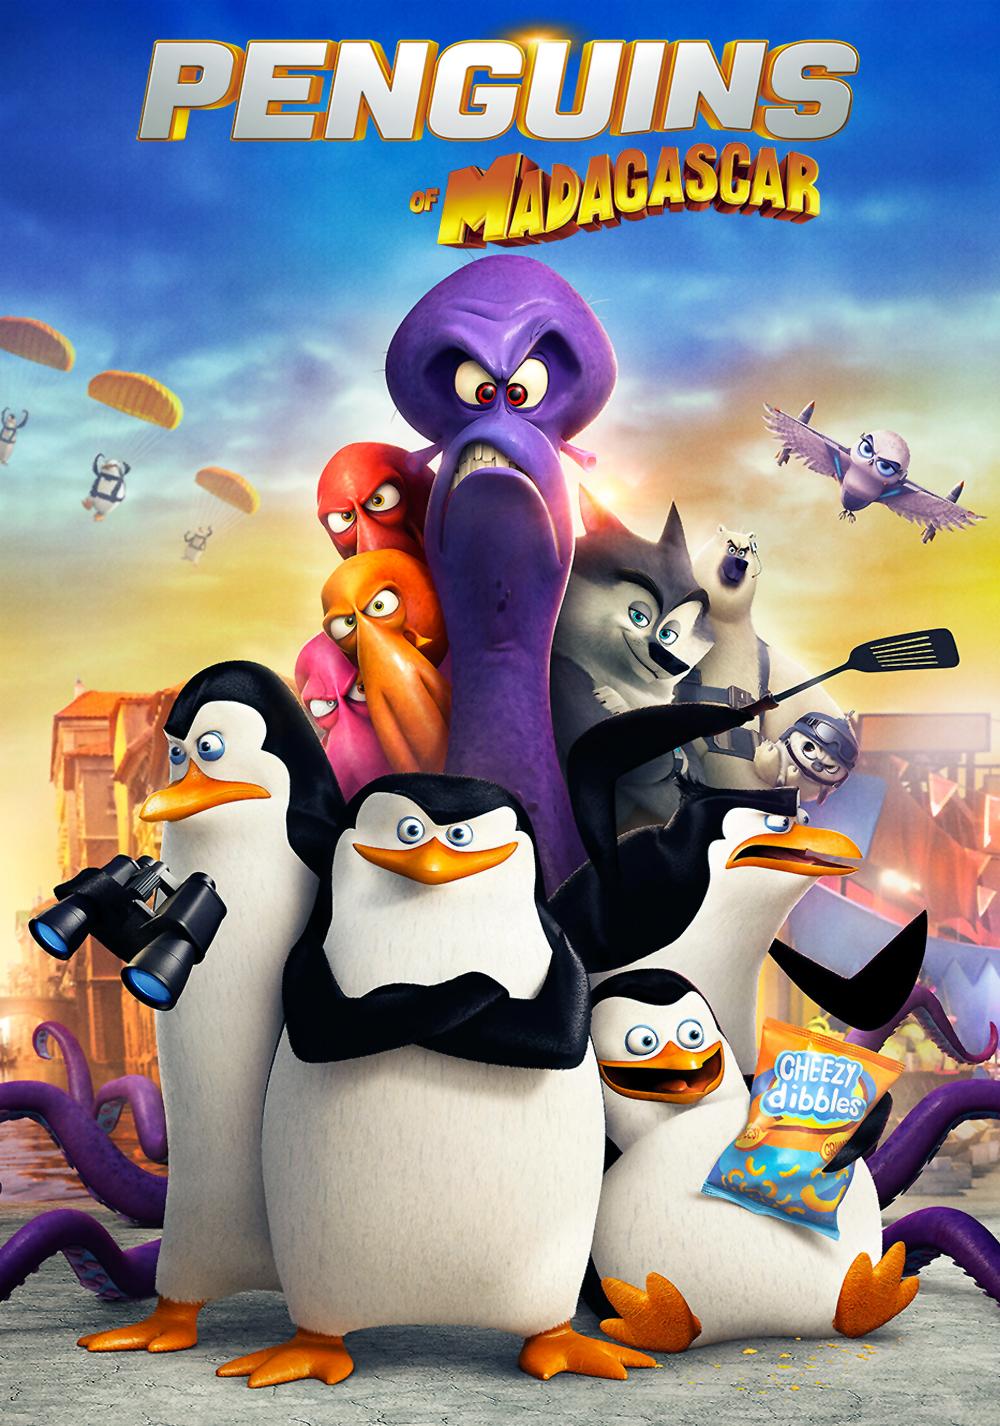 penguins-of-madagascar-5a4d70bde0bef.jpg